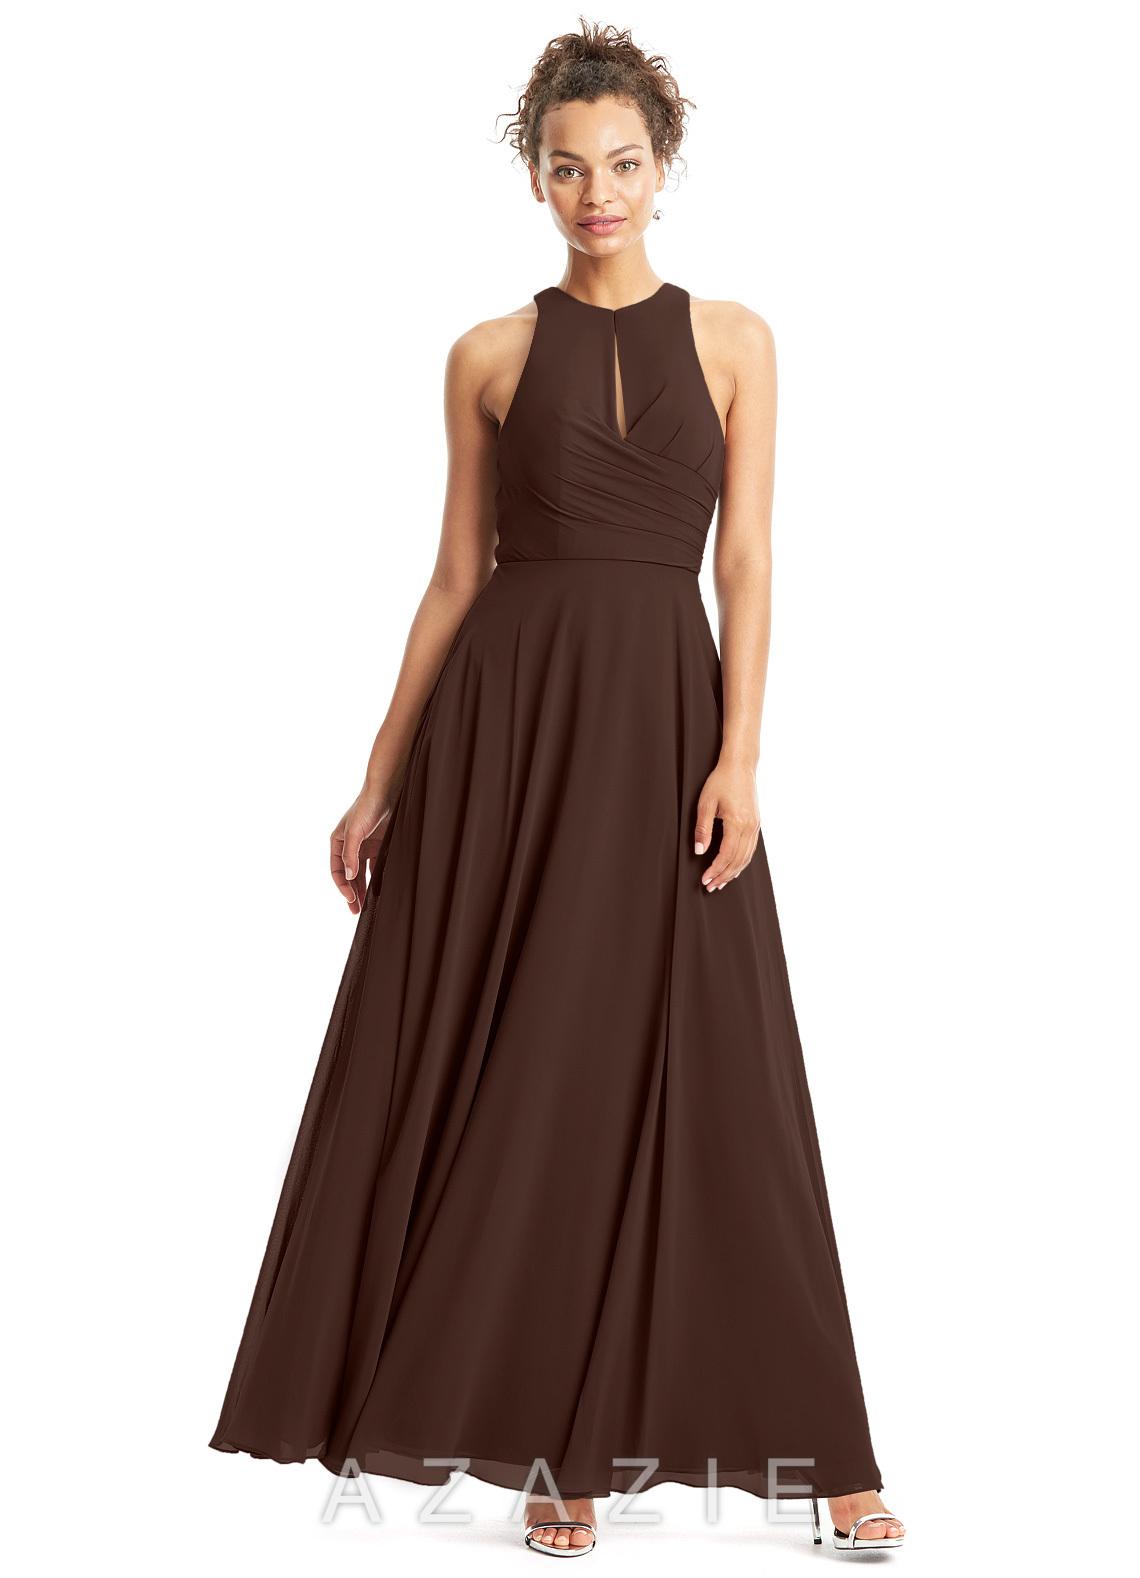 Azazie bridget bridesmaid dress azazie color chocolate ombrellifo Choice Image